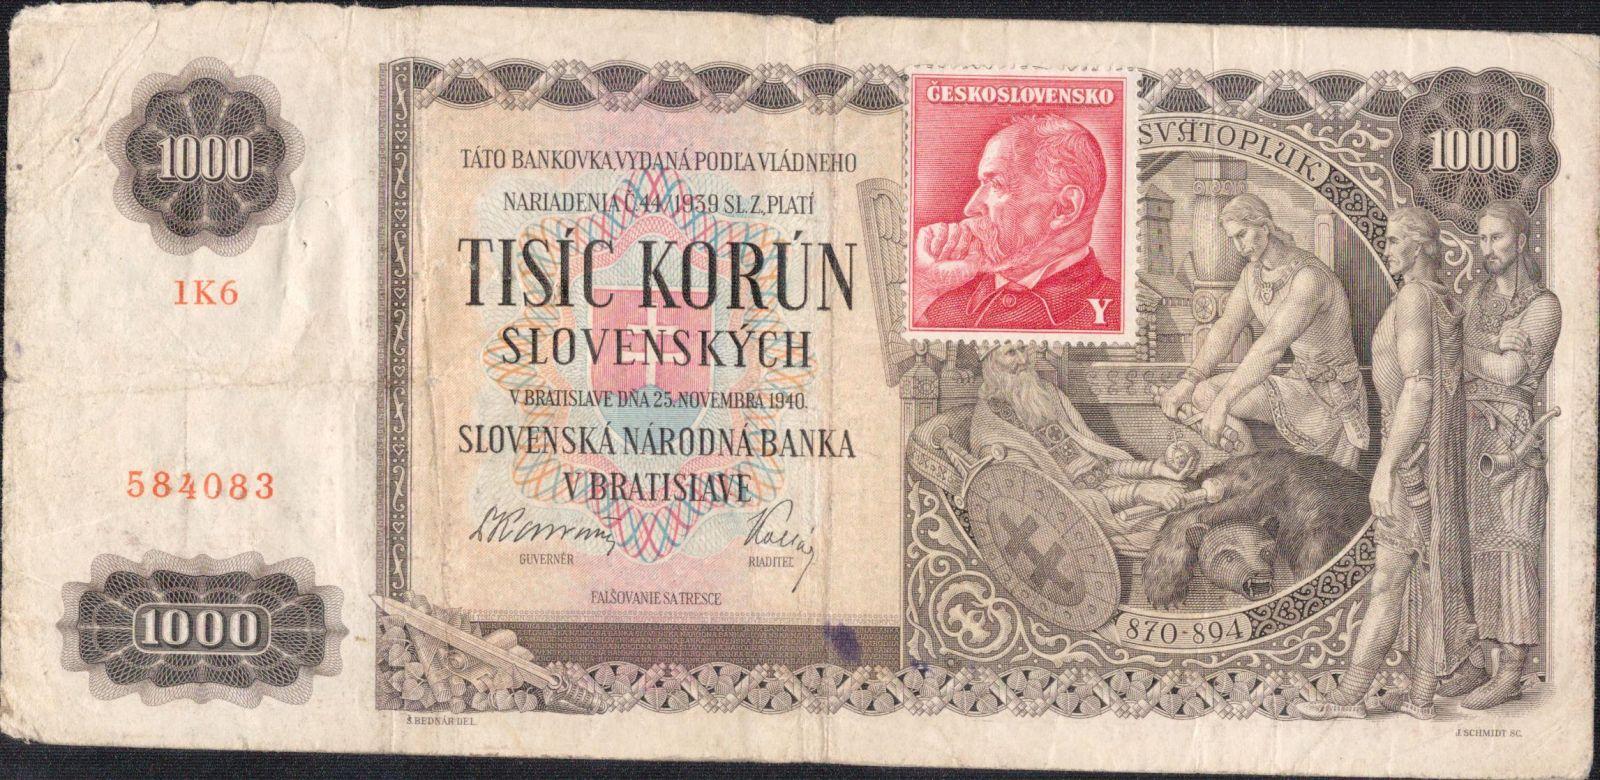 1000Ks/1940-kolek ČSR/, stav 4+, série 1K6